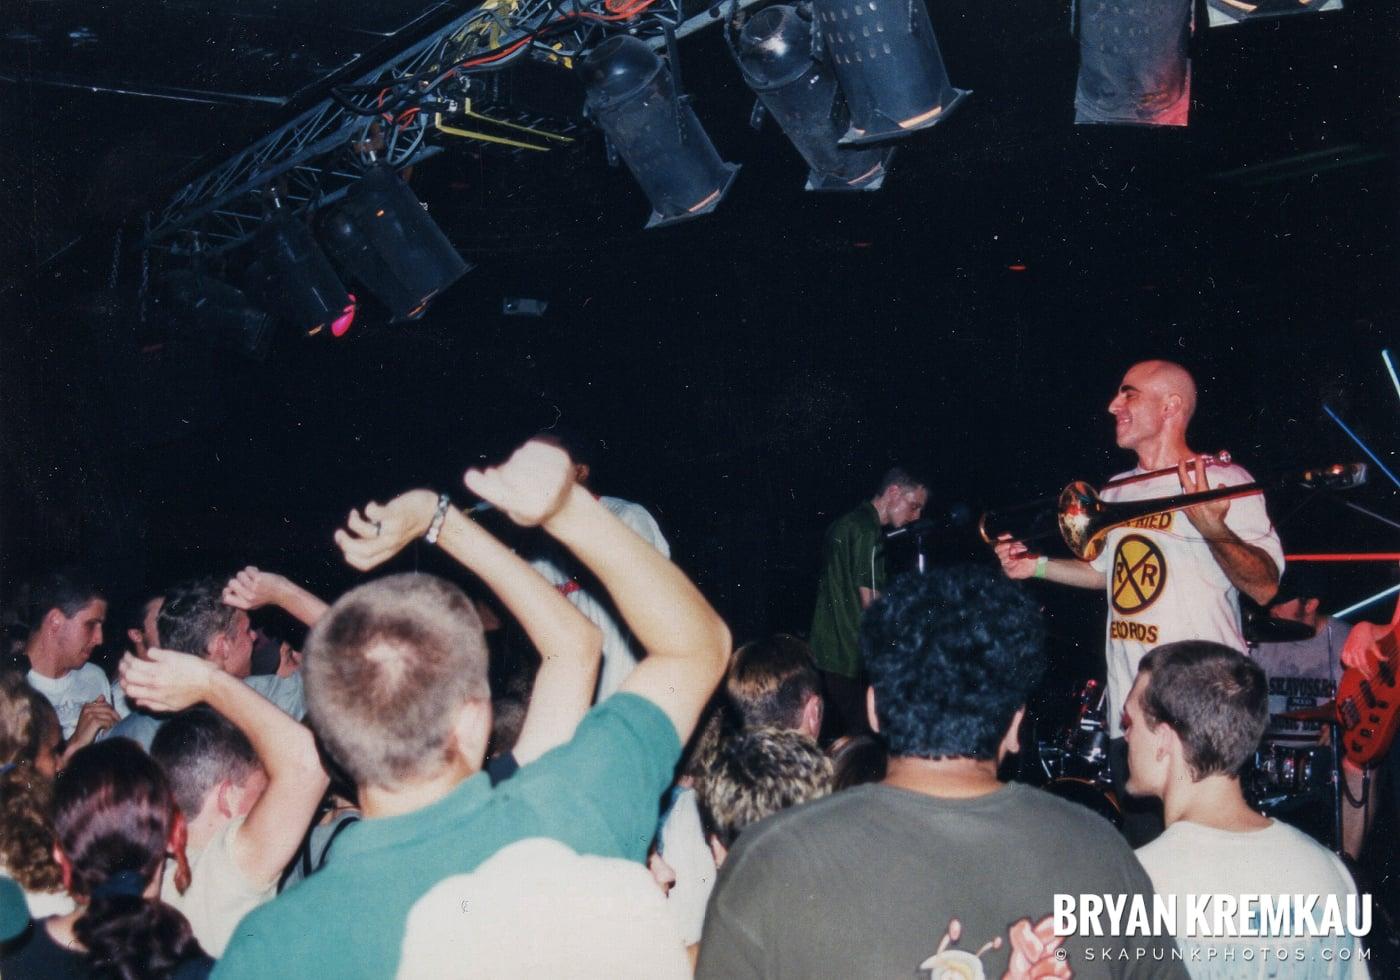 Pilfers @ Skater's World, Wayne, NJ - 1999 (18)